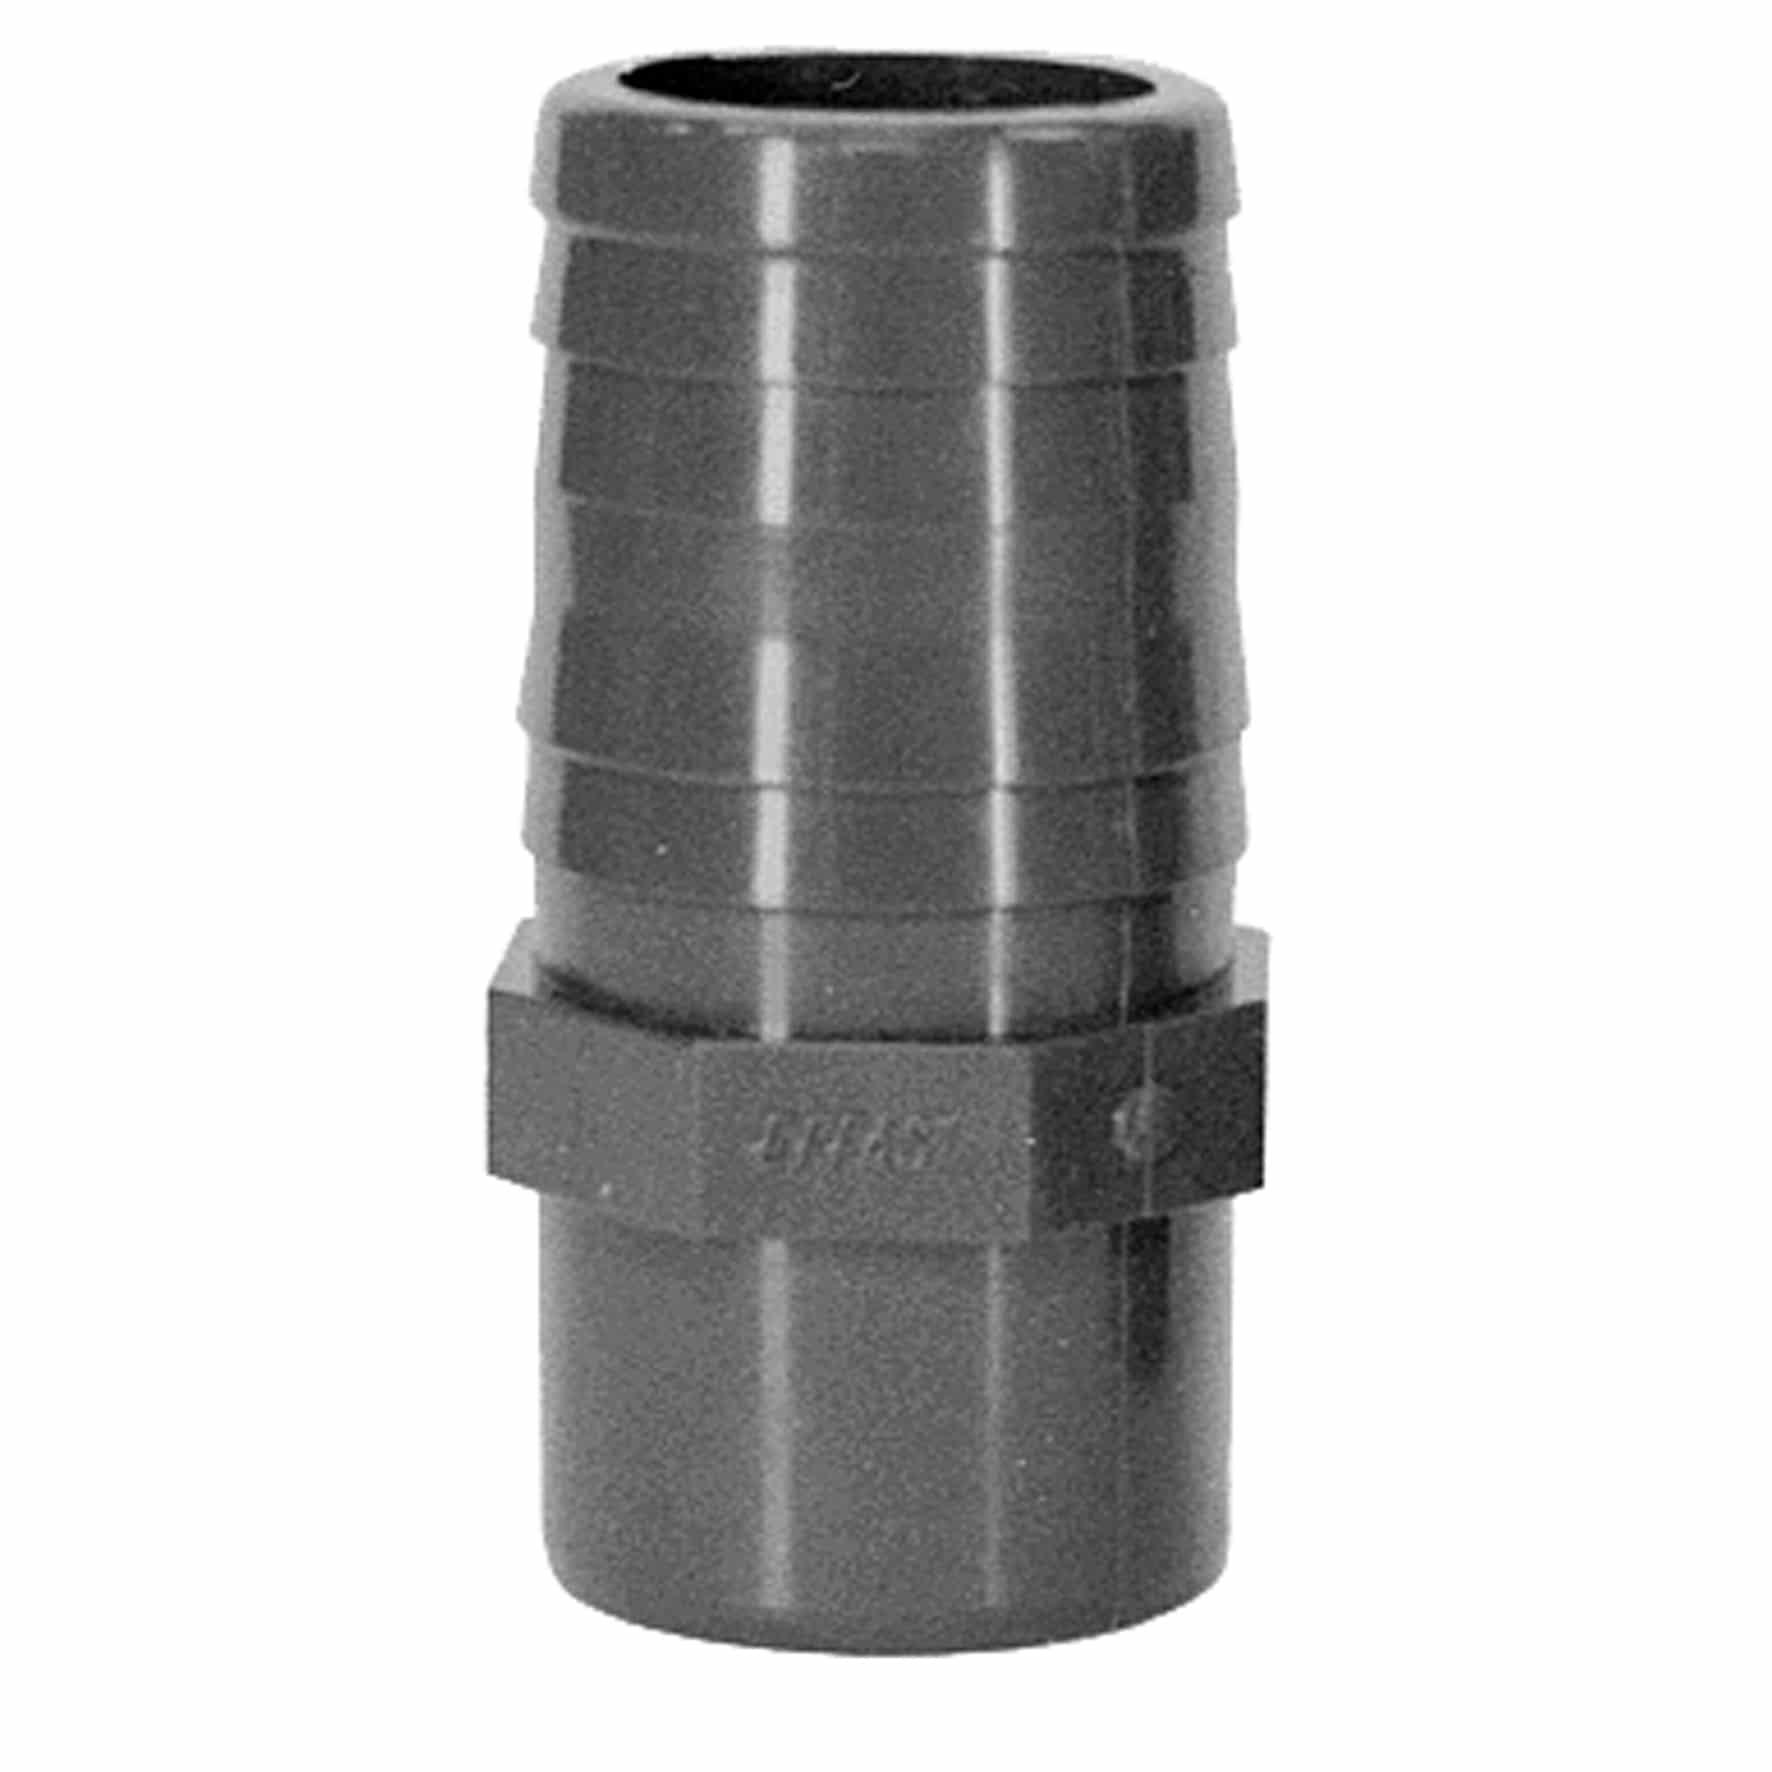 PVC-U Portagomma - EFFAST - 100% Made in Italy